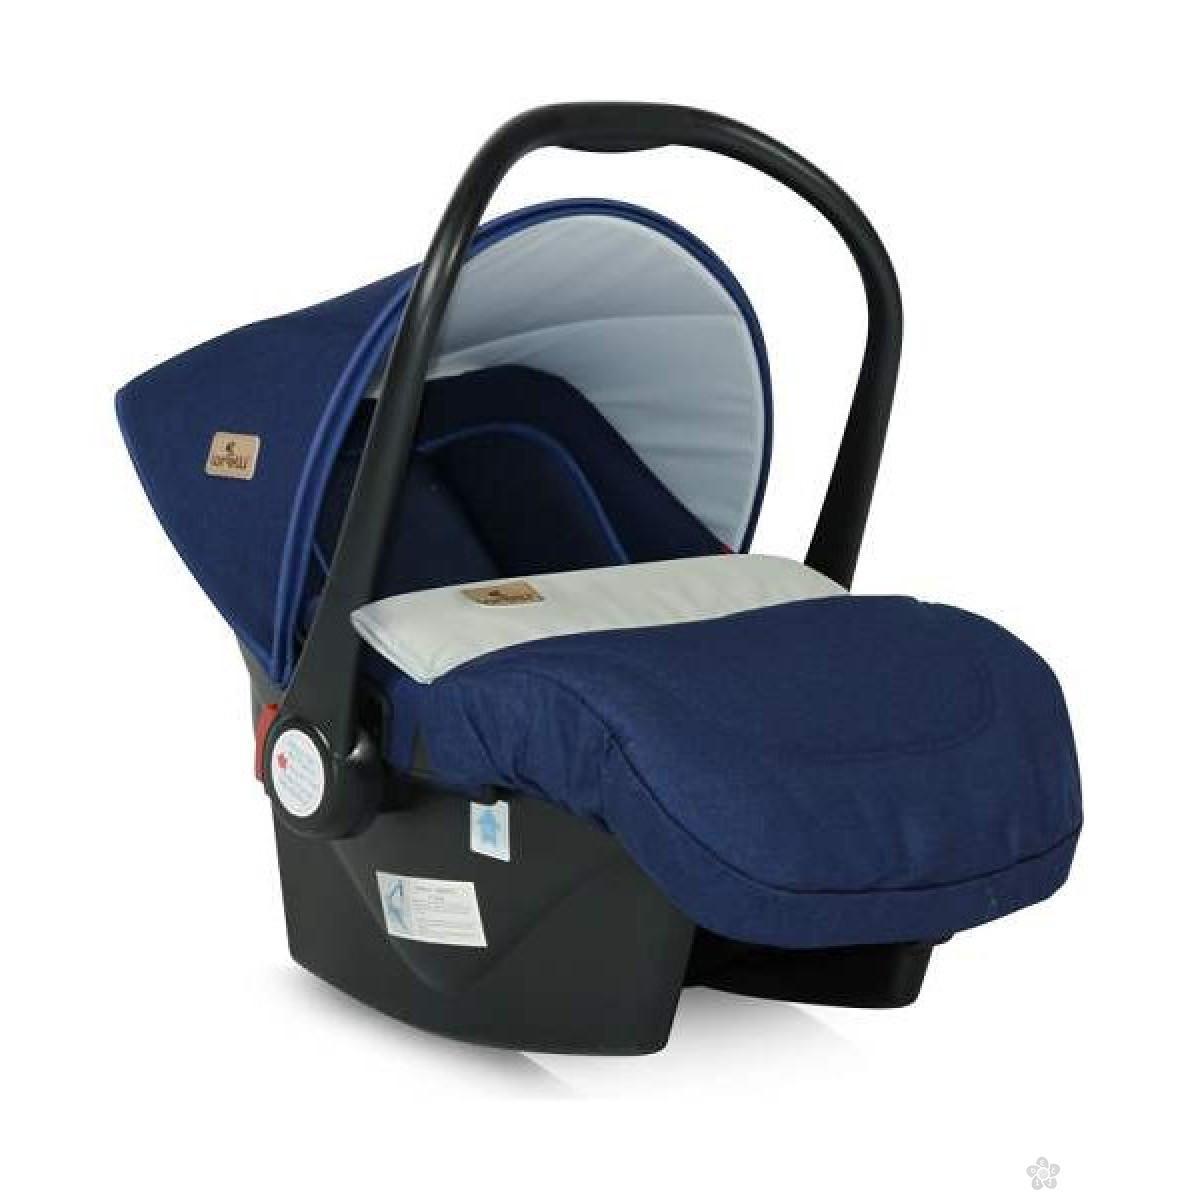 Auto Sedište Lifesaver Blue 0-13kg 10070301842